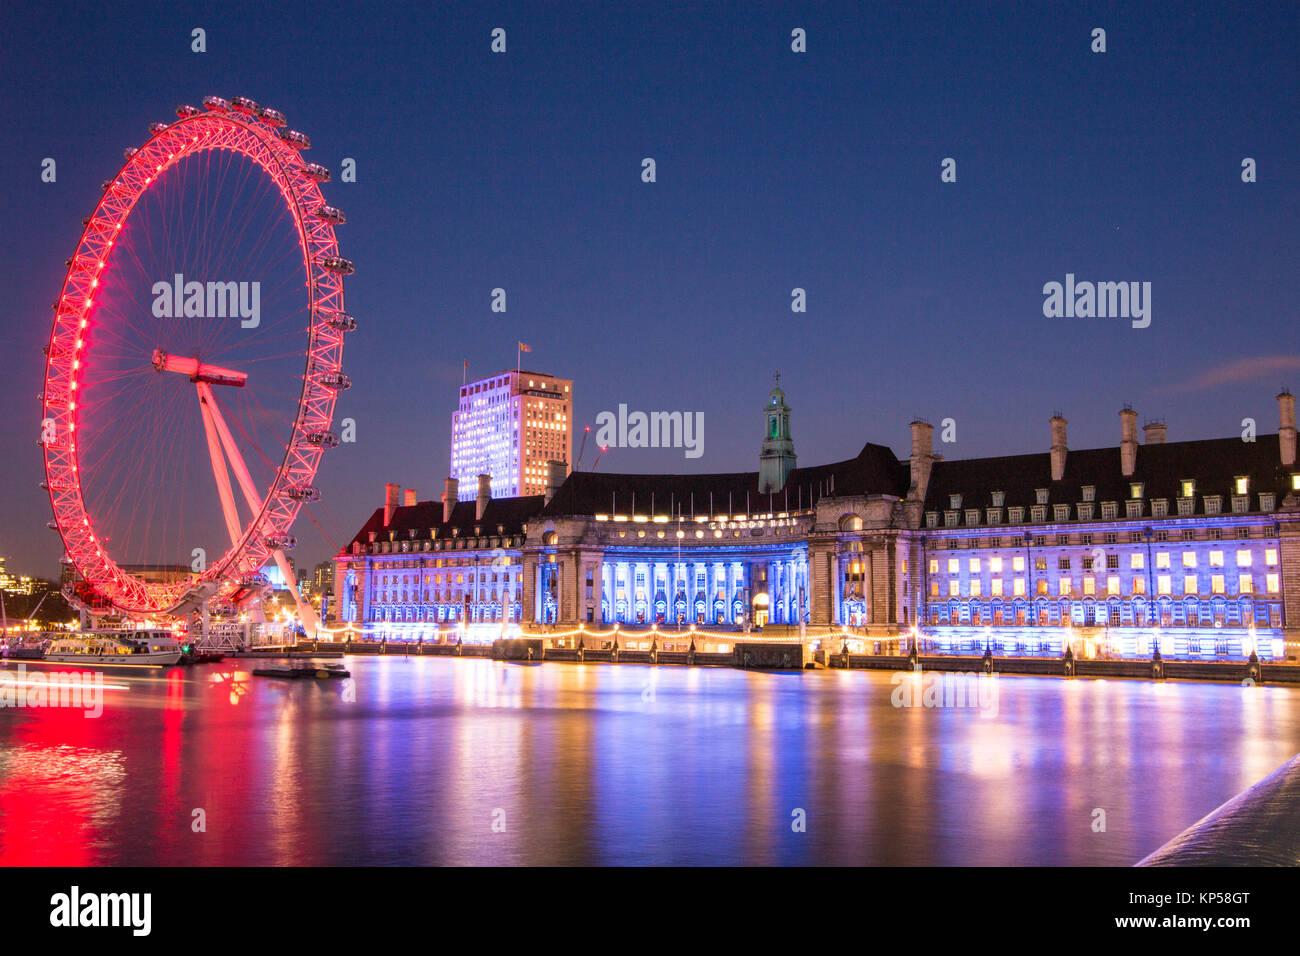 Famous London Landmark, the London Eye and London Aquarium, illuminated at night Stock Photo